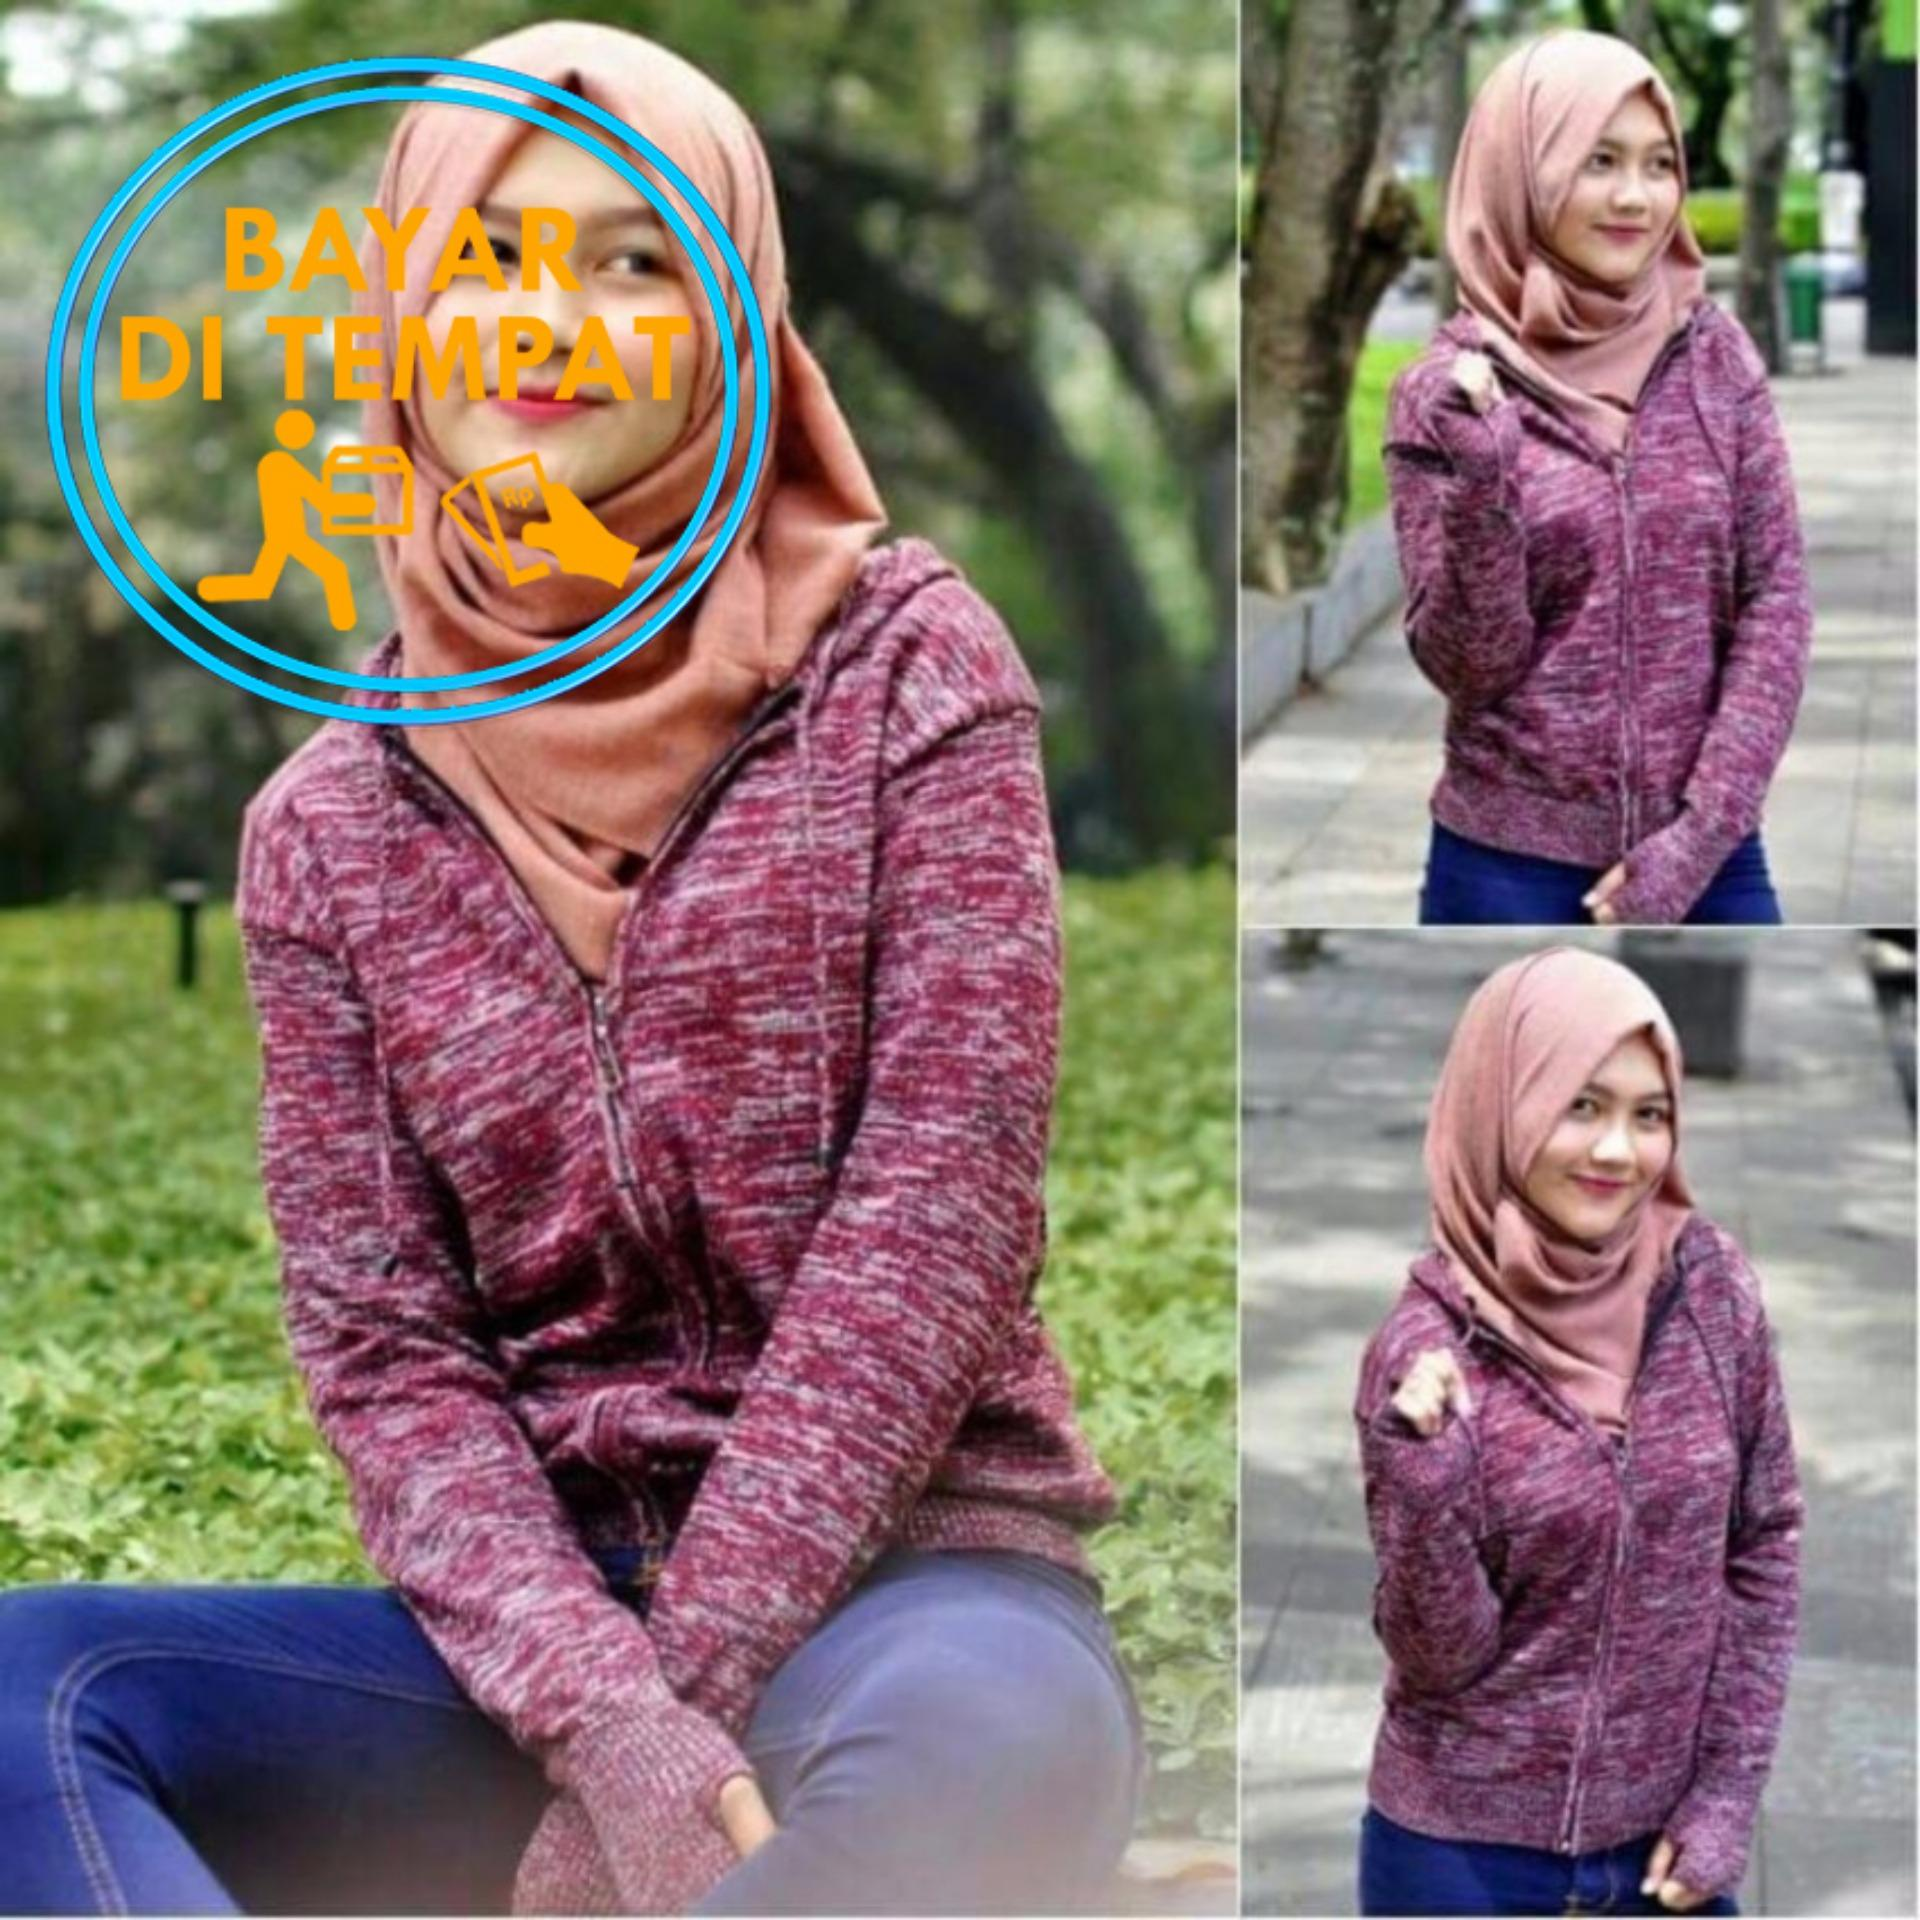 Jual Sweater Rajut Round Hand Wanita Maroon Twotone Jempol Bolong Termurah